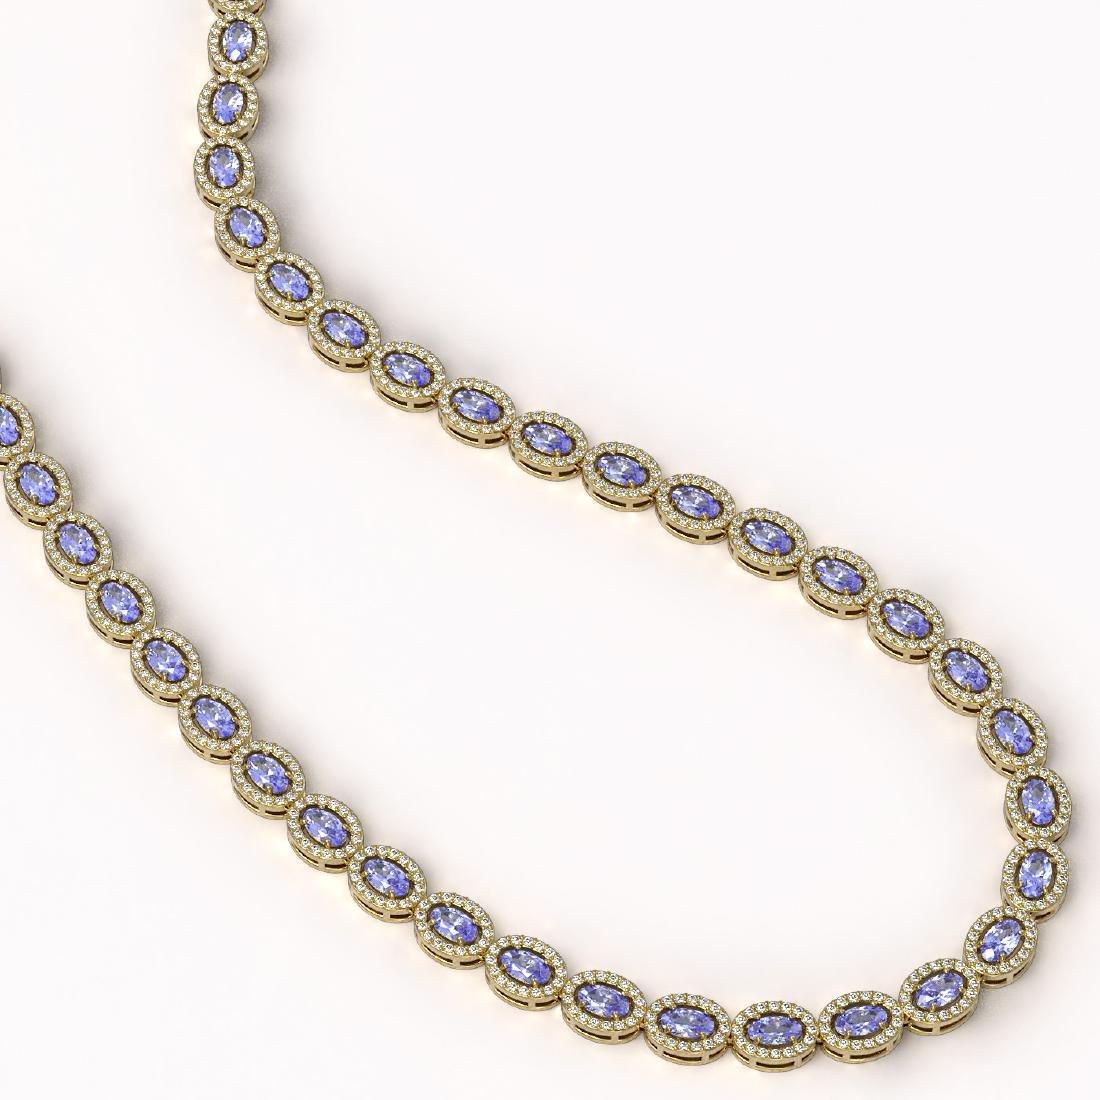 22.62 CTW Tanzanite & Diamond Halo Necklace 10K Yellow - 2